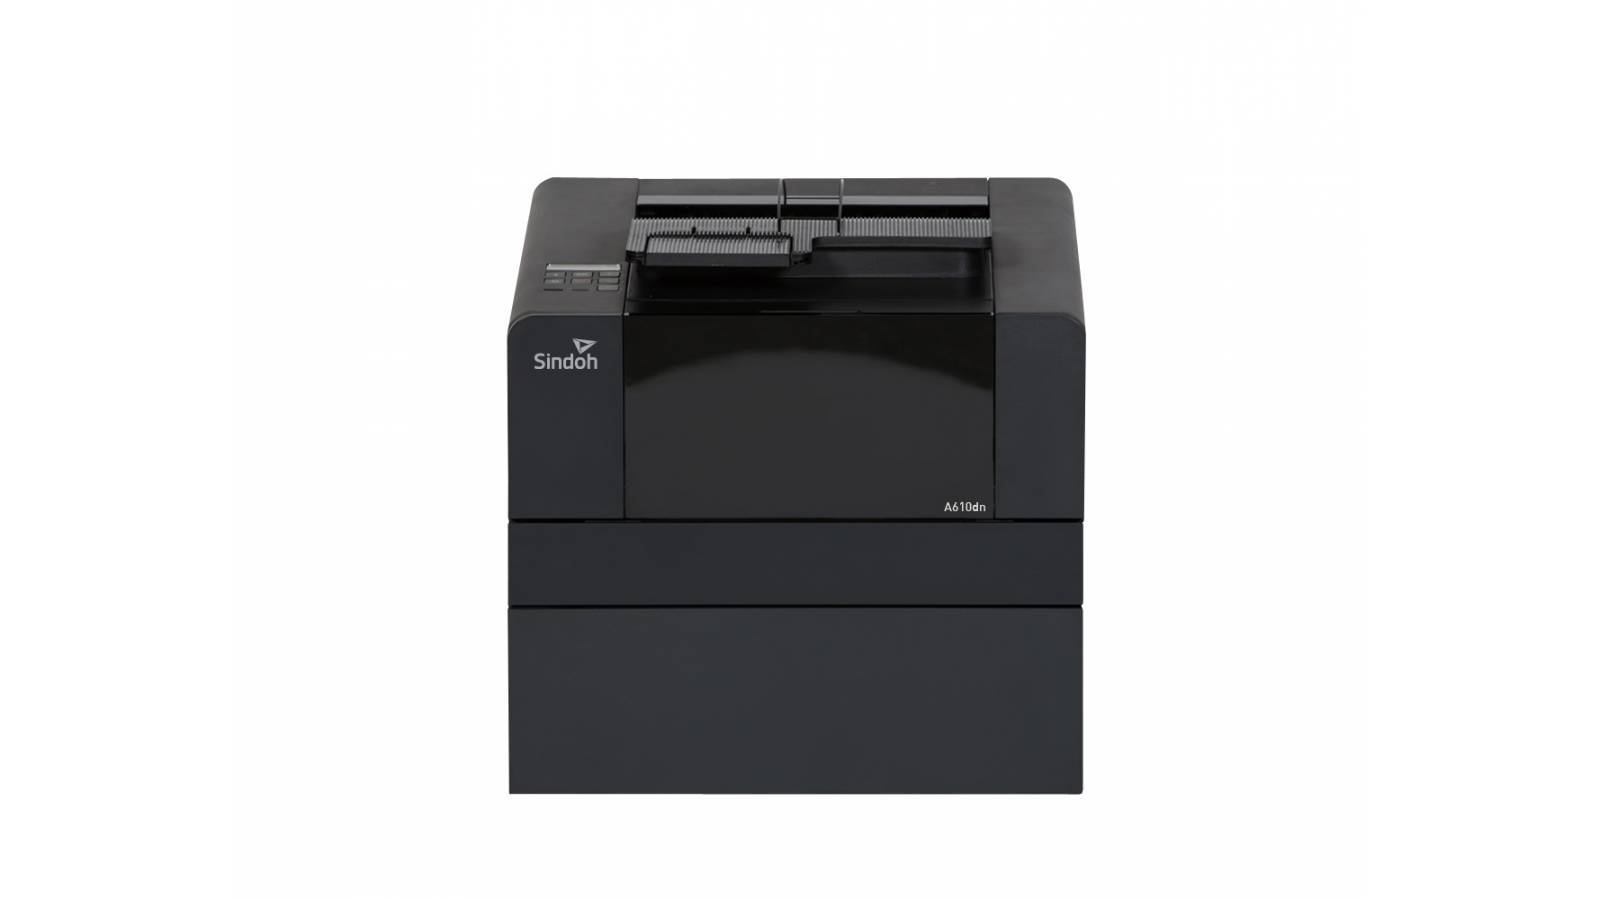 Impresora láser monocromática Sindoh A610